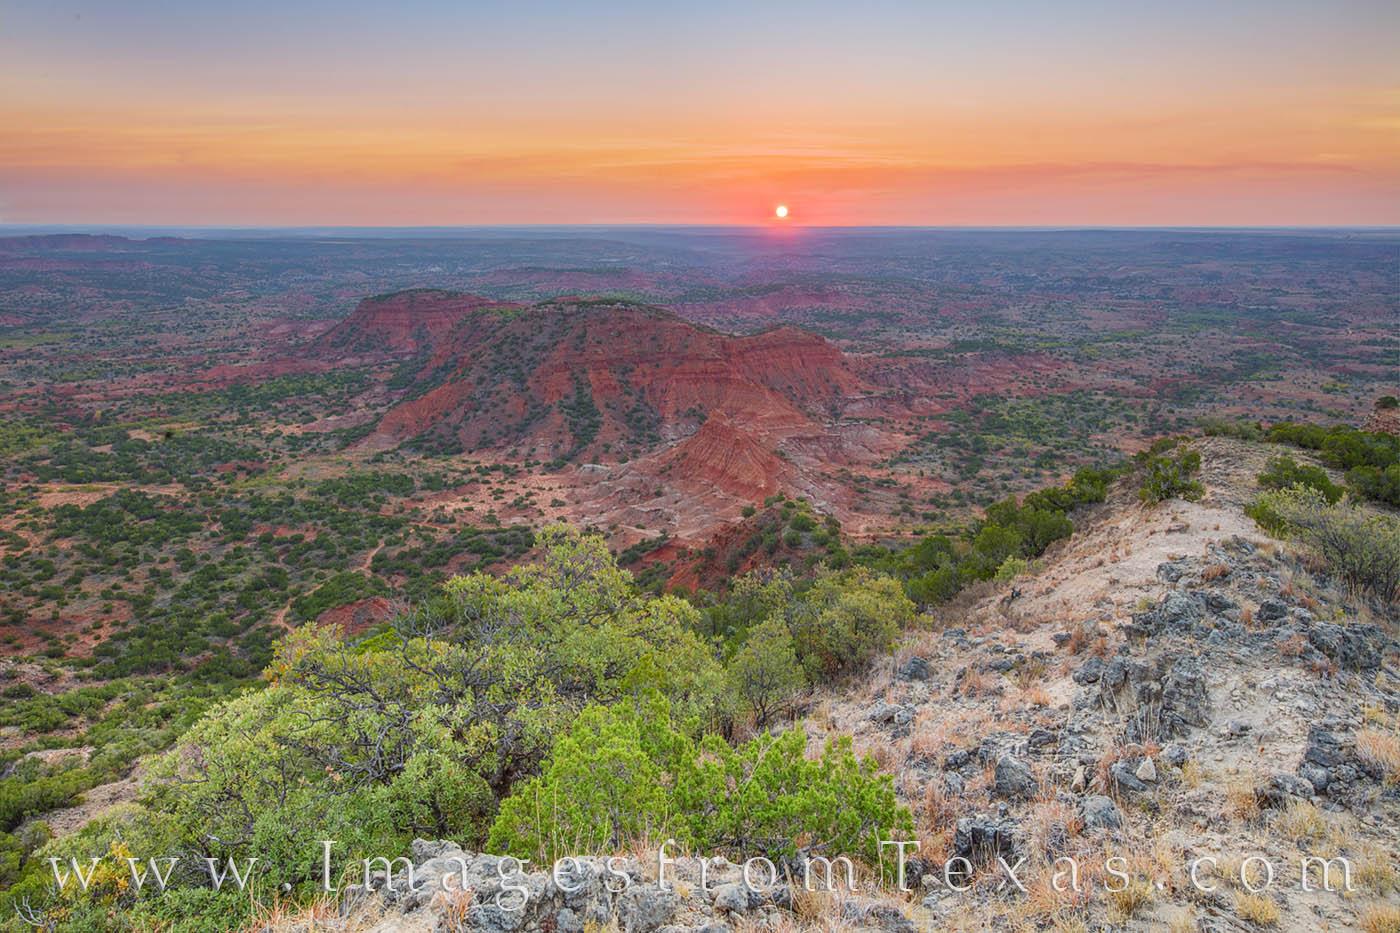 haynes ridge, sunrise, caprock canyon, caprock prints, hiking, overlook, morning, hiking, photo